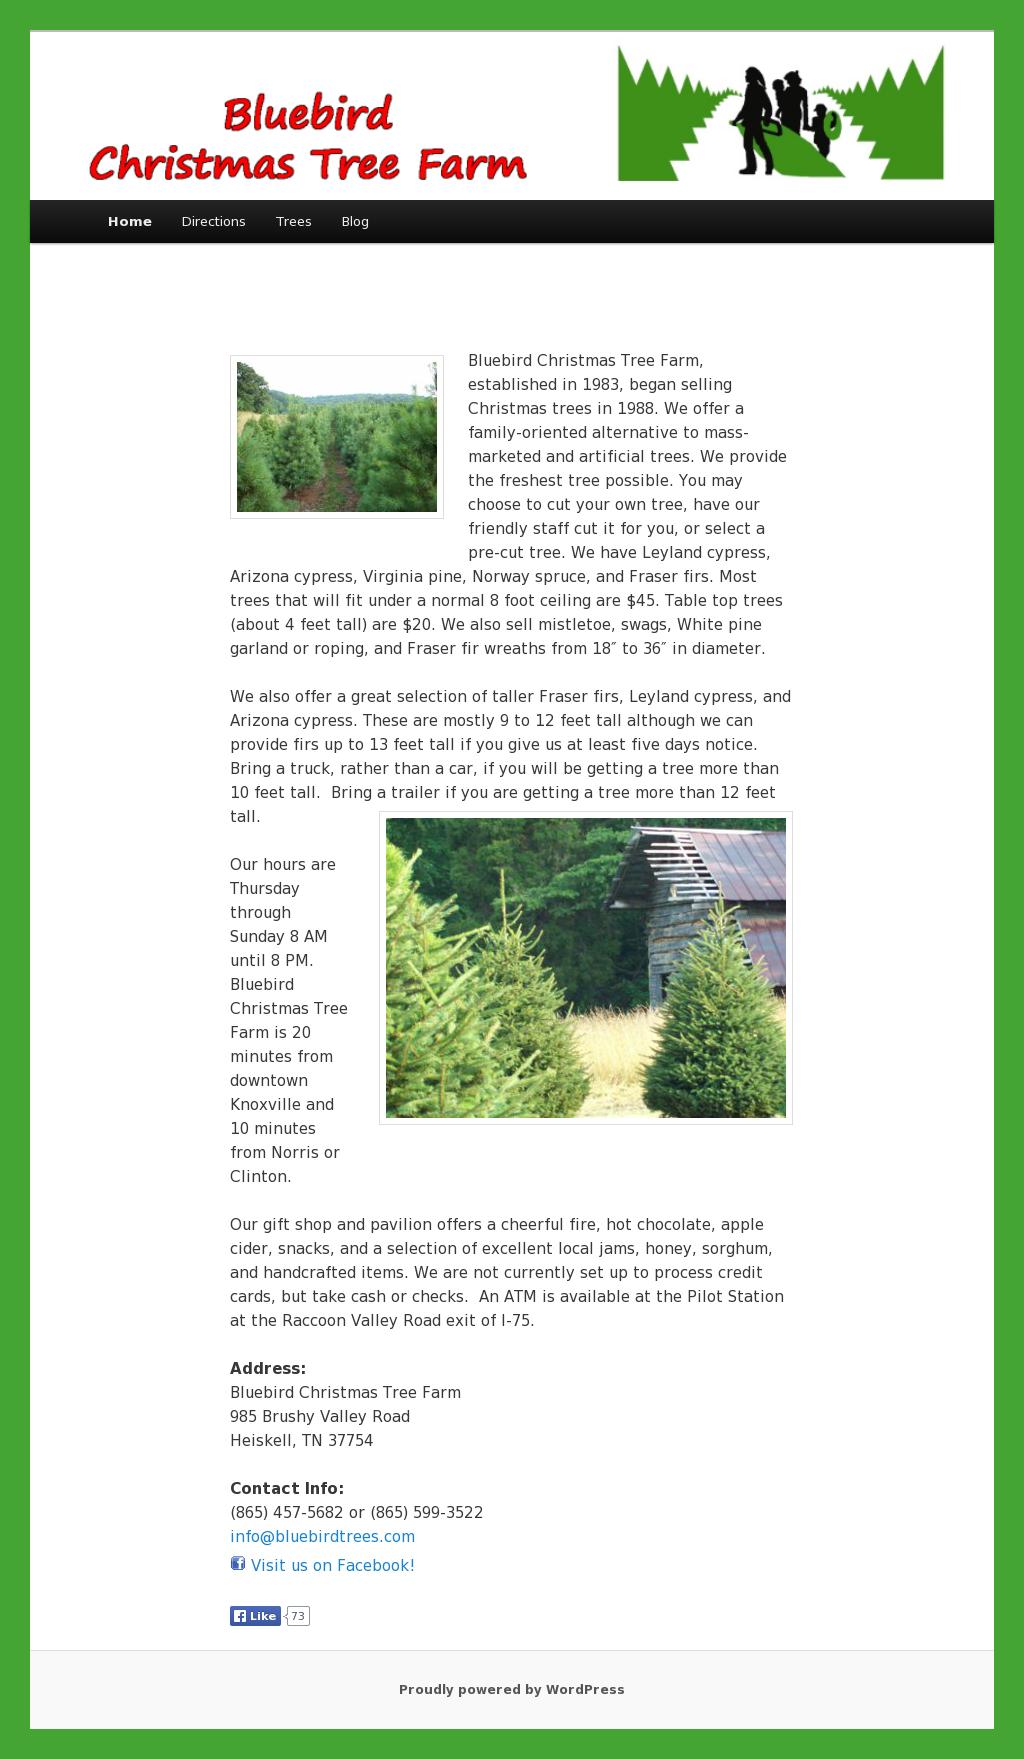 bluebird christmas tree farm competitors revenue and employees owler company profile - Bluebird Christmas Tree Farm